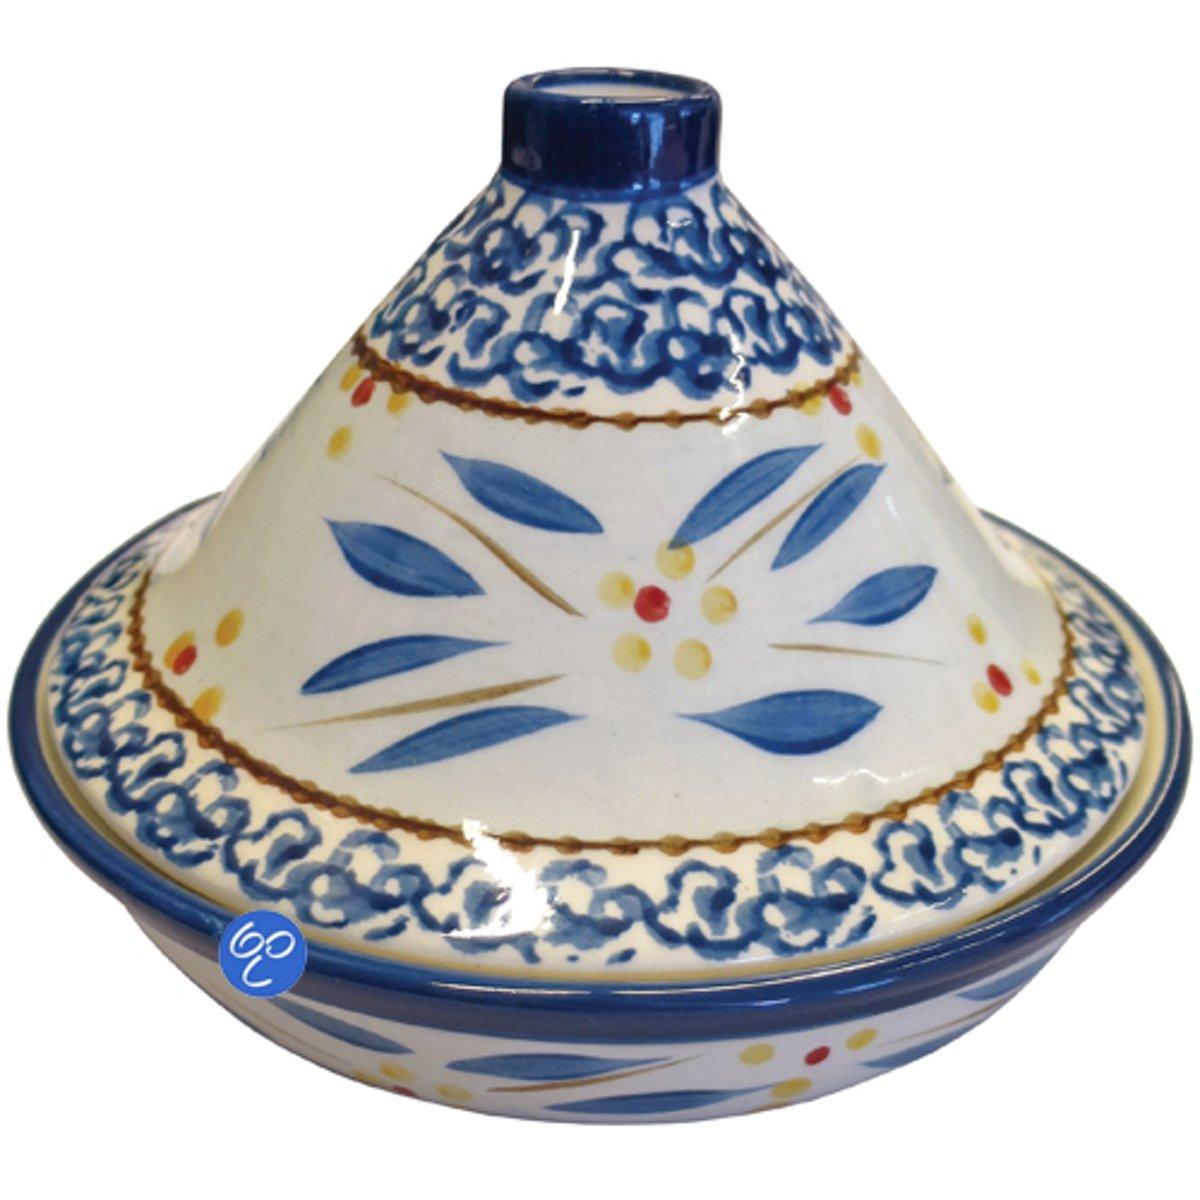 Lavandoux - Tapas Mini Tajine - Ø15 cm - 200ml - Old World Blue